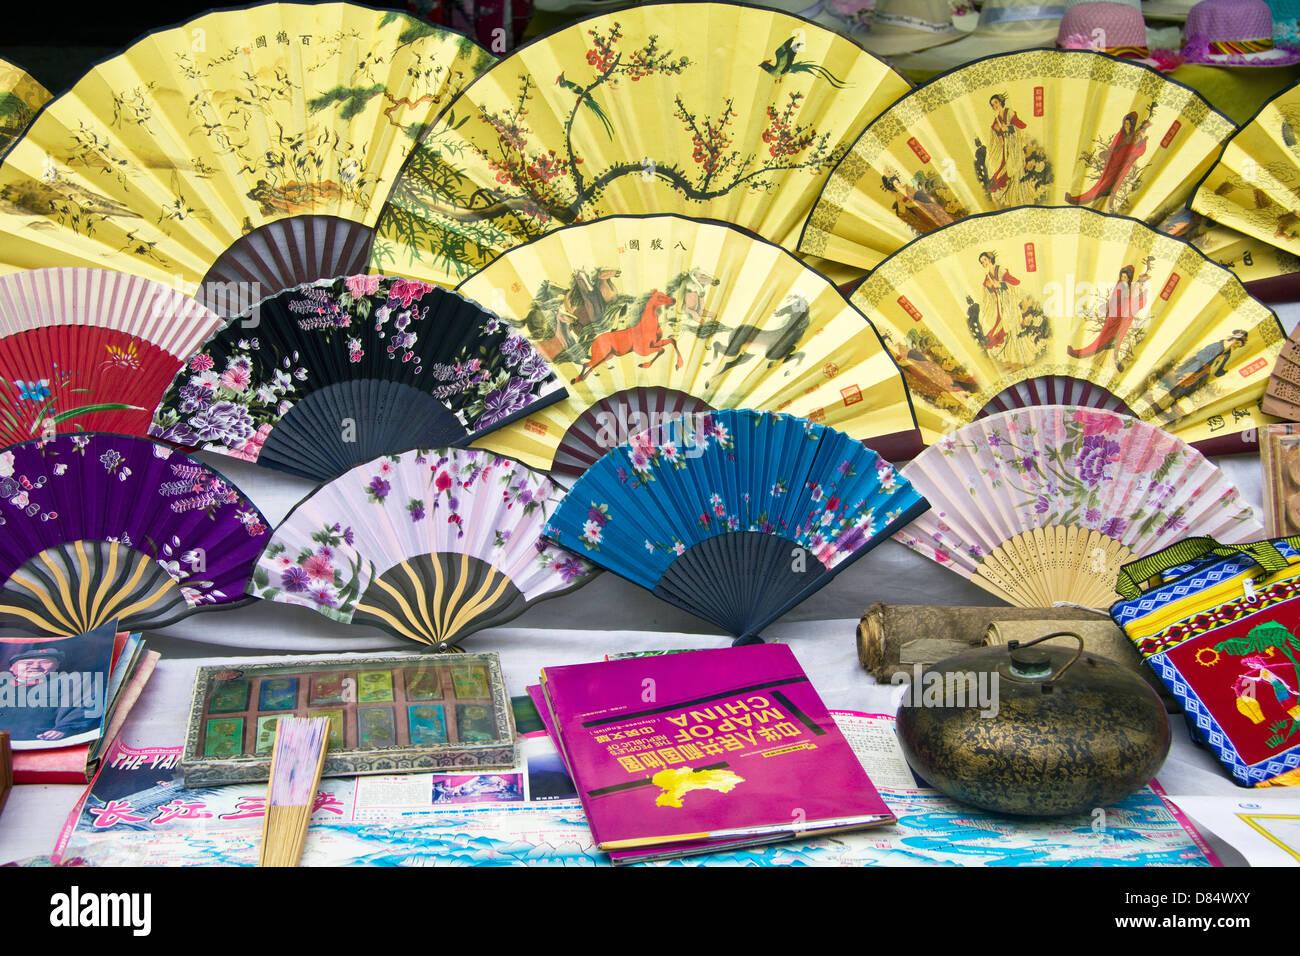 Souvenirs display, Three Gorges cruise, Yangtze River, China - Stock Image